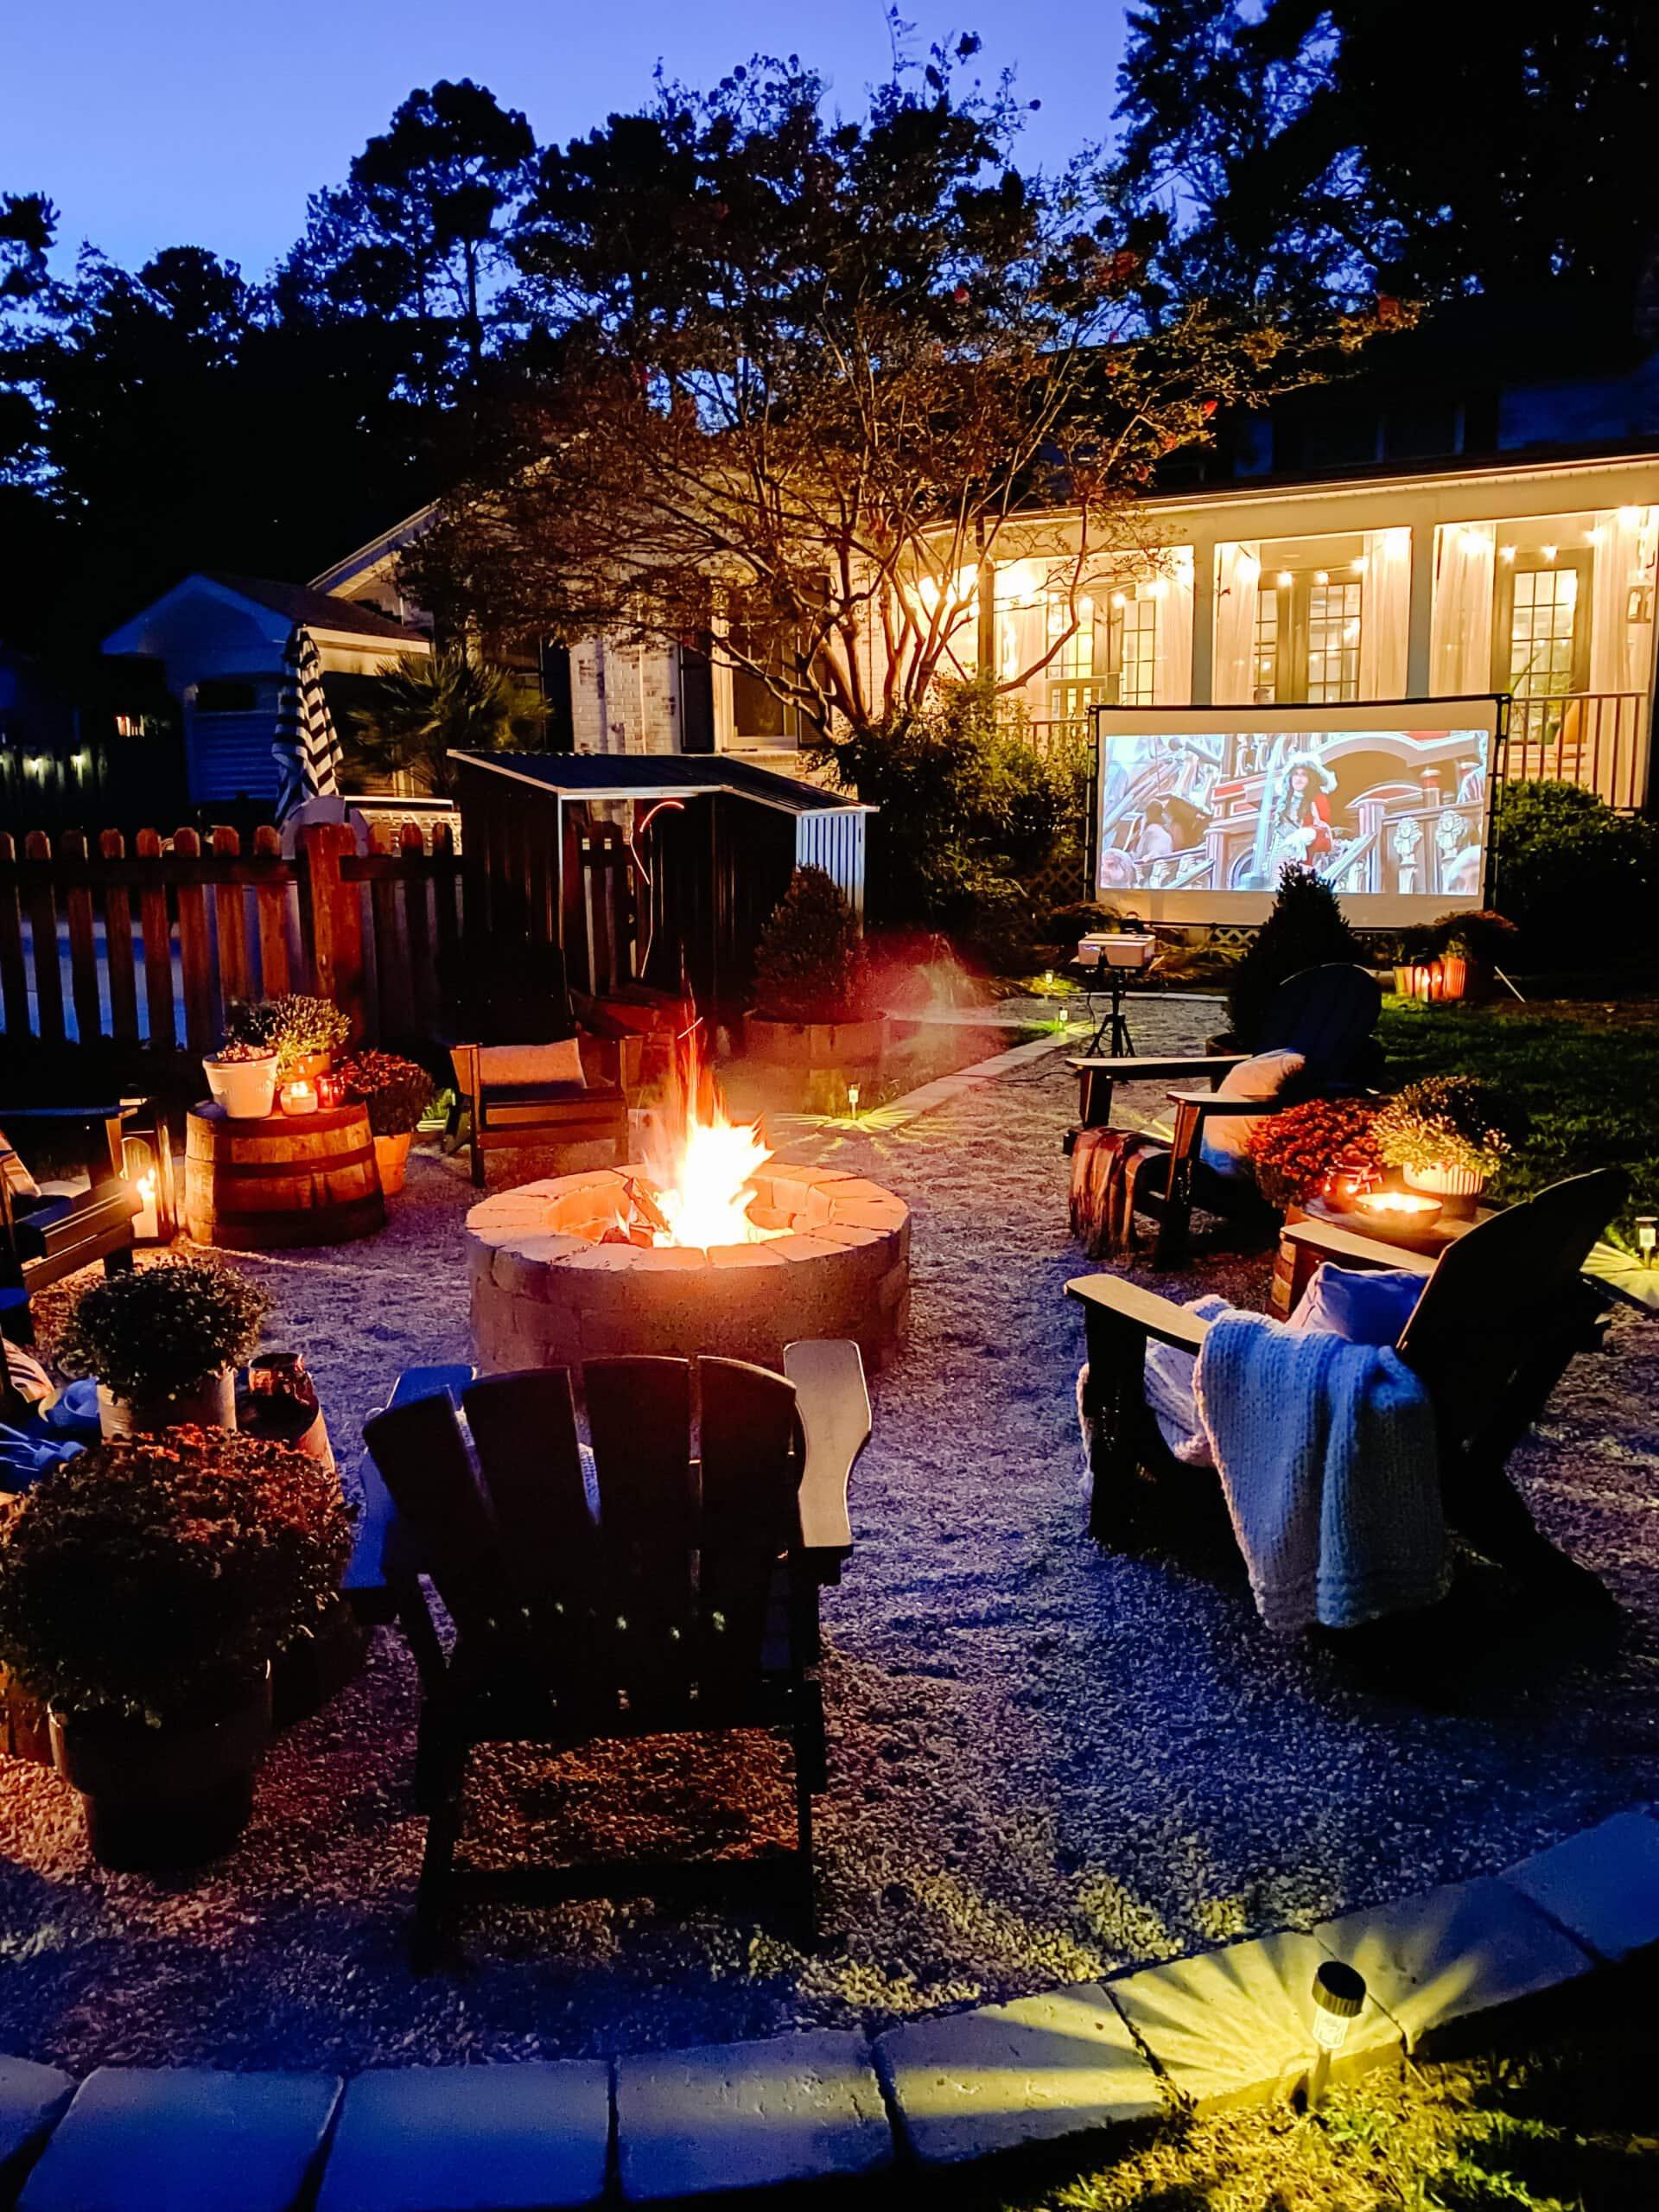 backyard fire pit ideas - outdoor movie theater